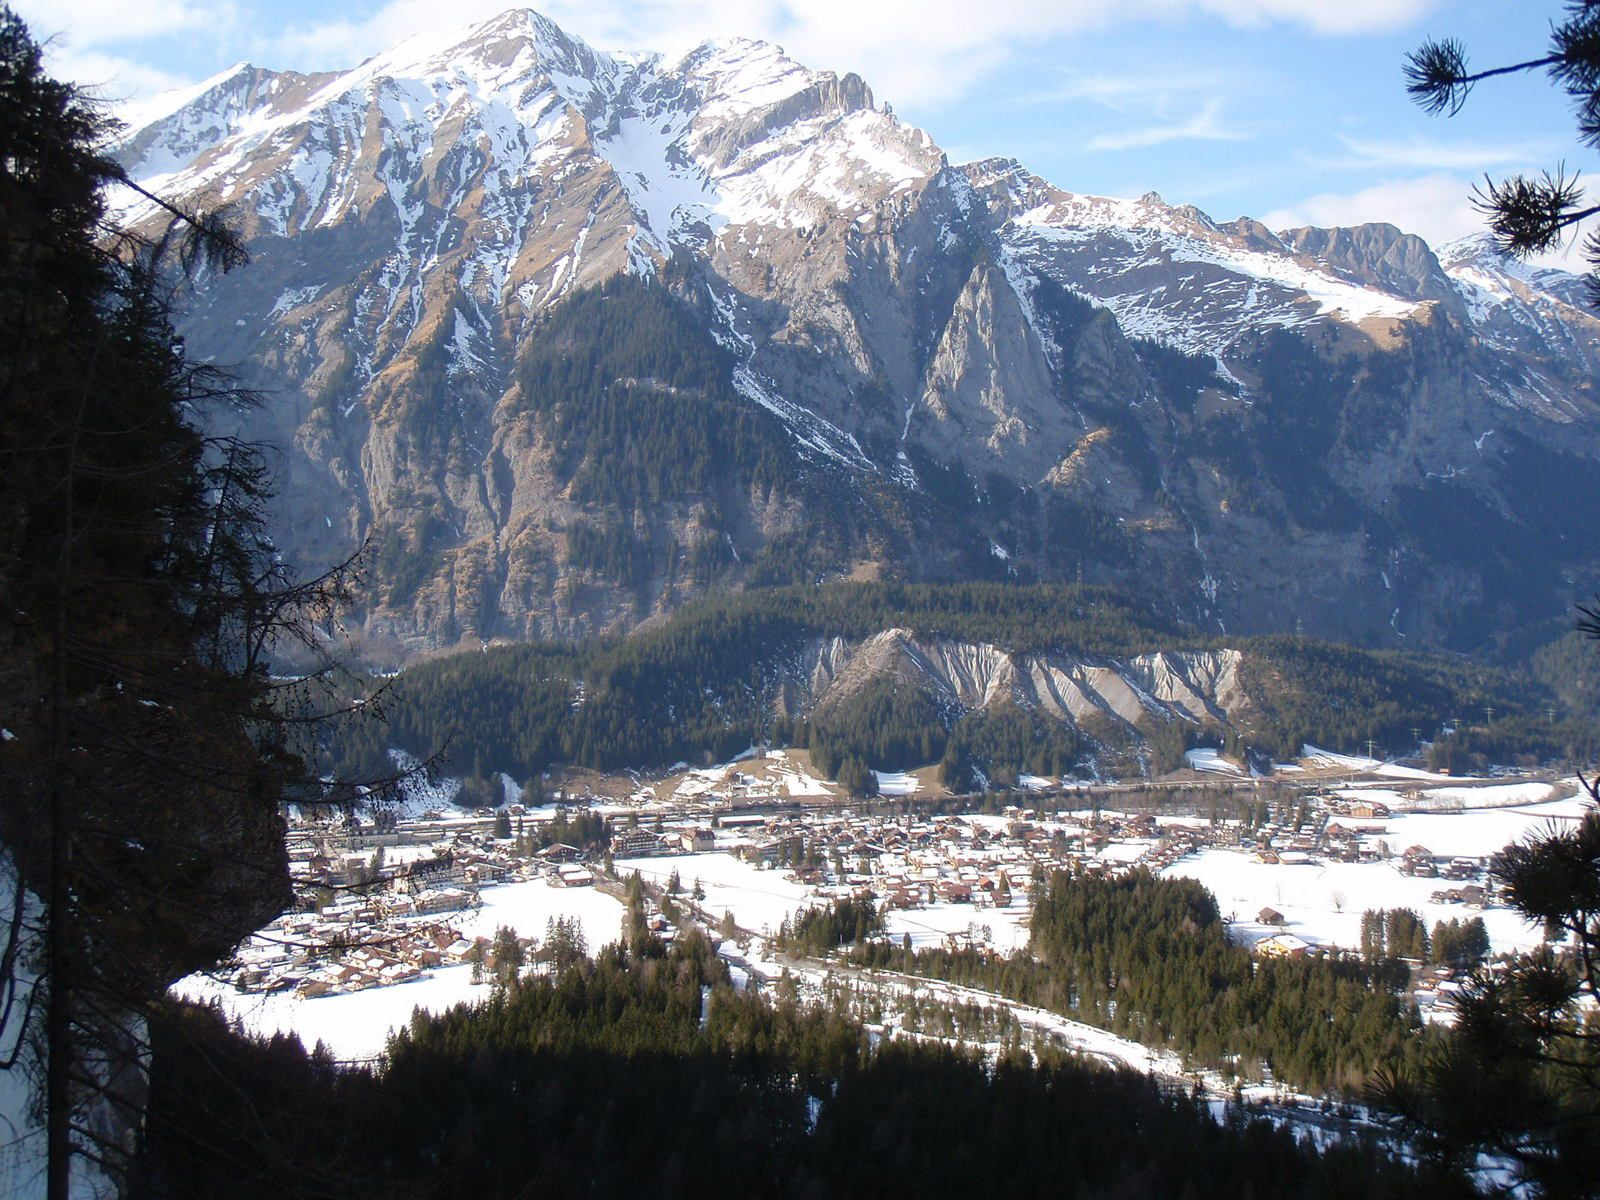 Kandersteg - Oeschinenwald: Namelos